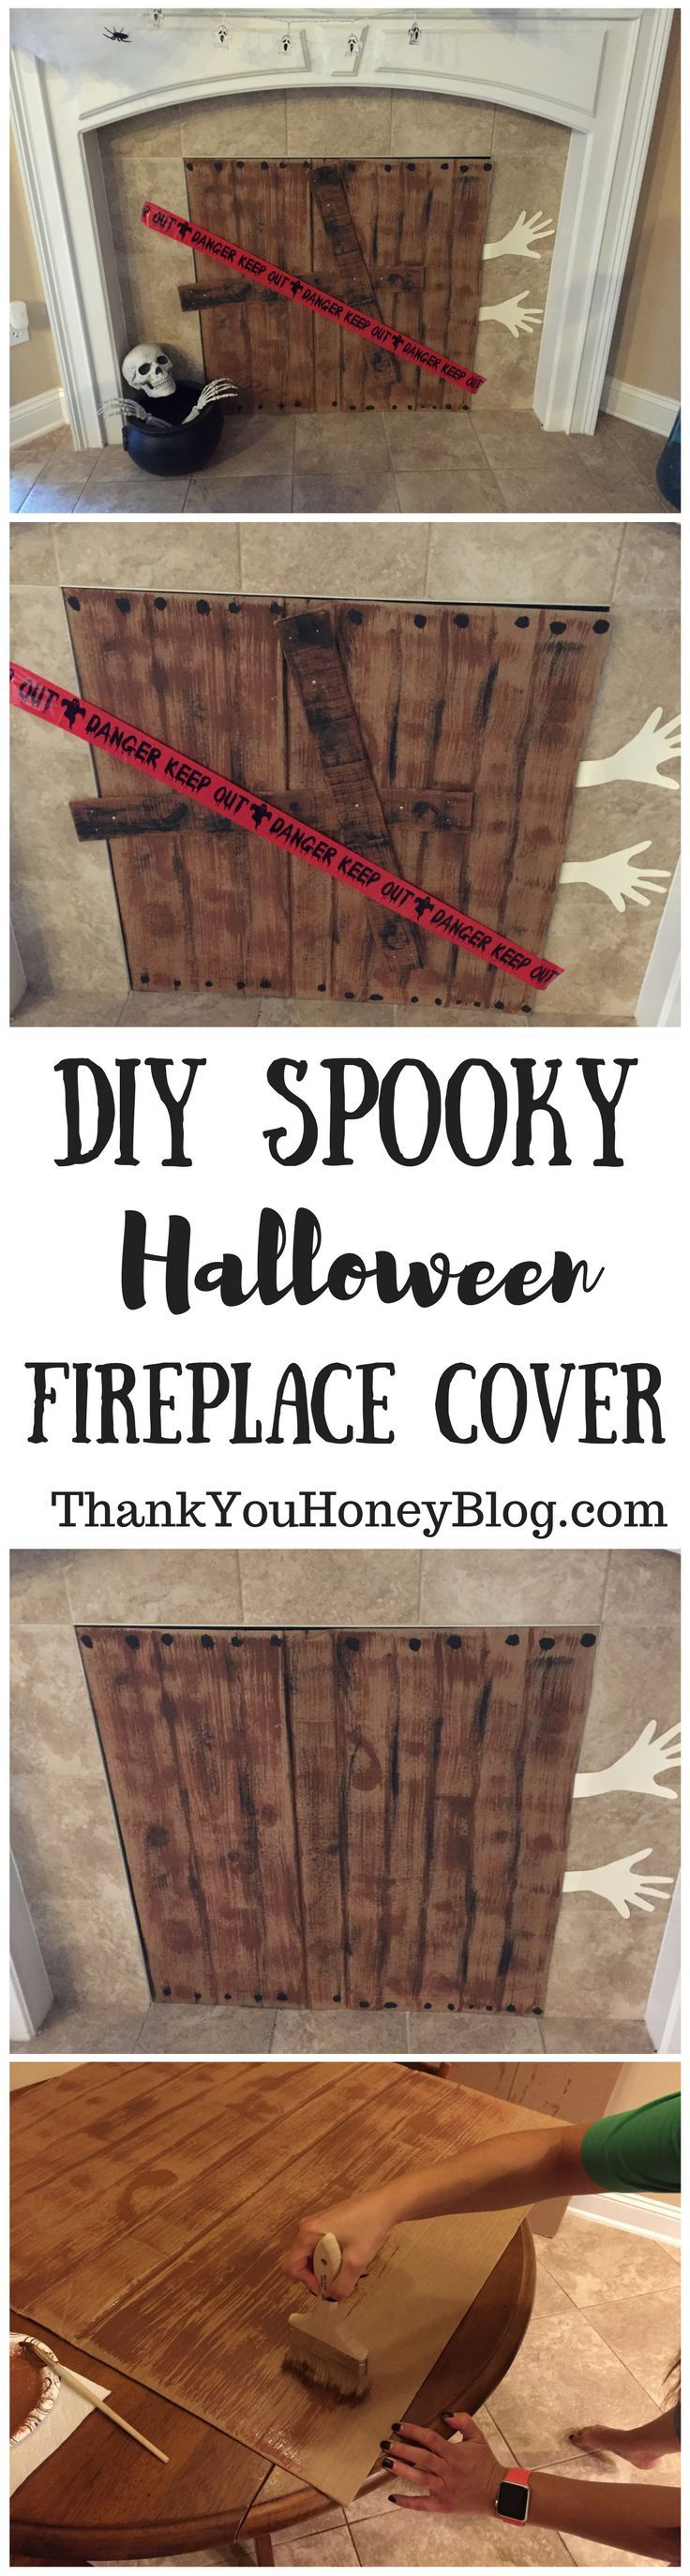 DIY Spooky Halloween Fireplace Cover Diy halloween